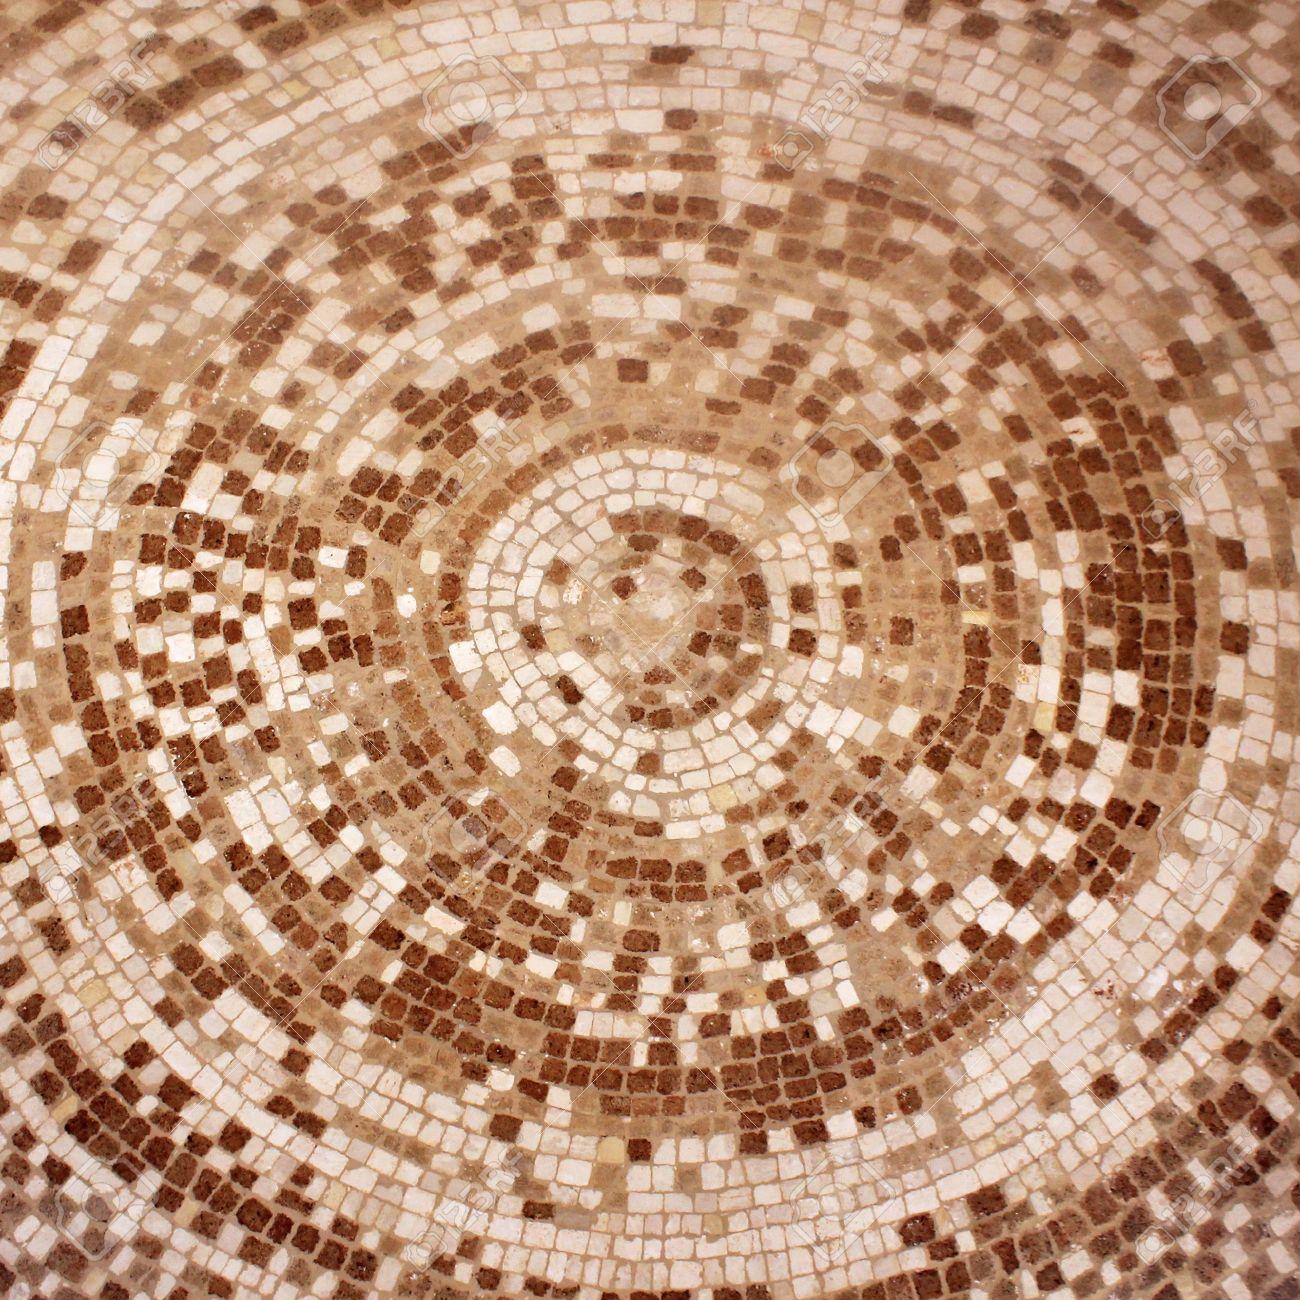 Circle Tiles Old Roman Beige And Brown Mosaic Ceramic Tiles In Circle Pattern